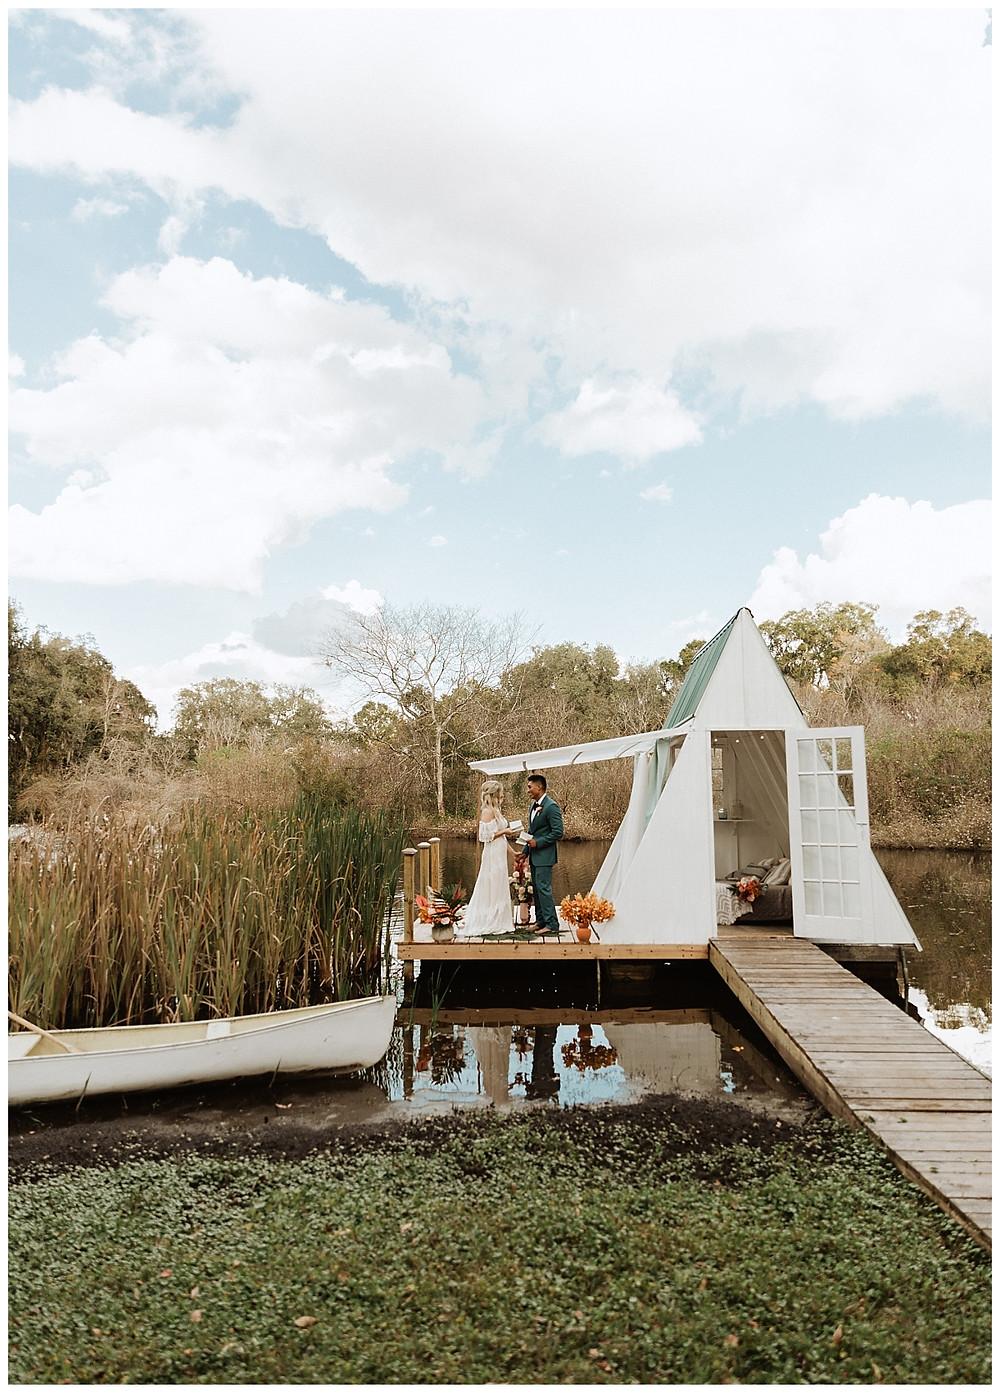 Elopement Vows at Boho A-Frame Floating Lakehouse at Enchanted Oaks Farms, Florida